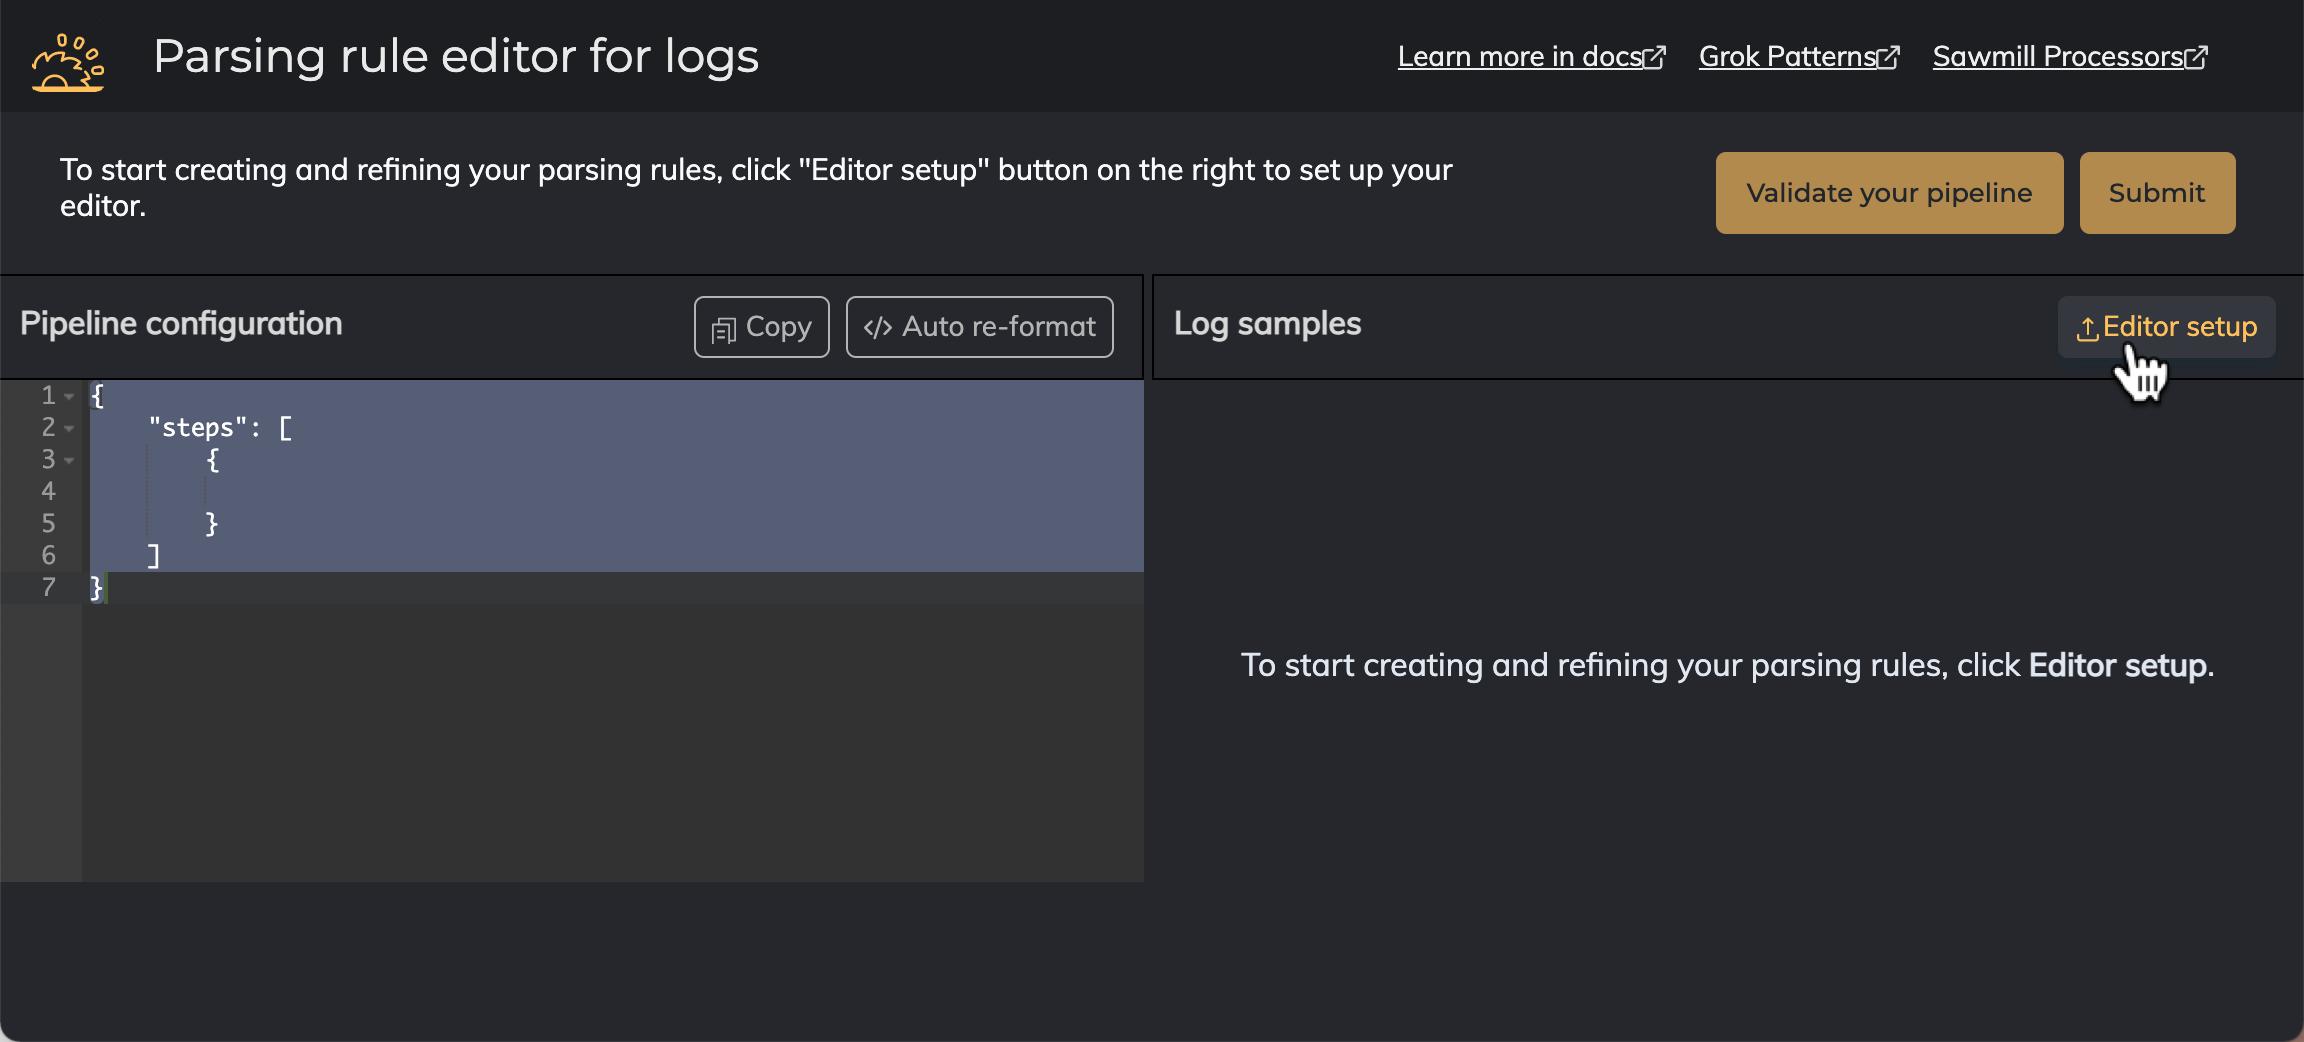 Sample log process